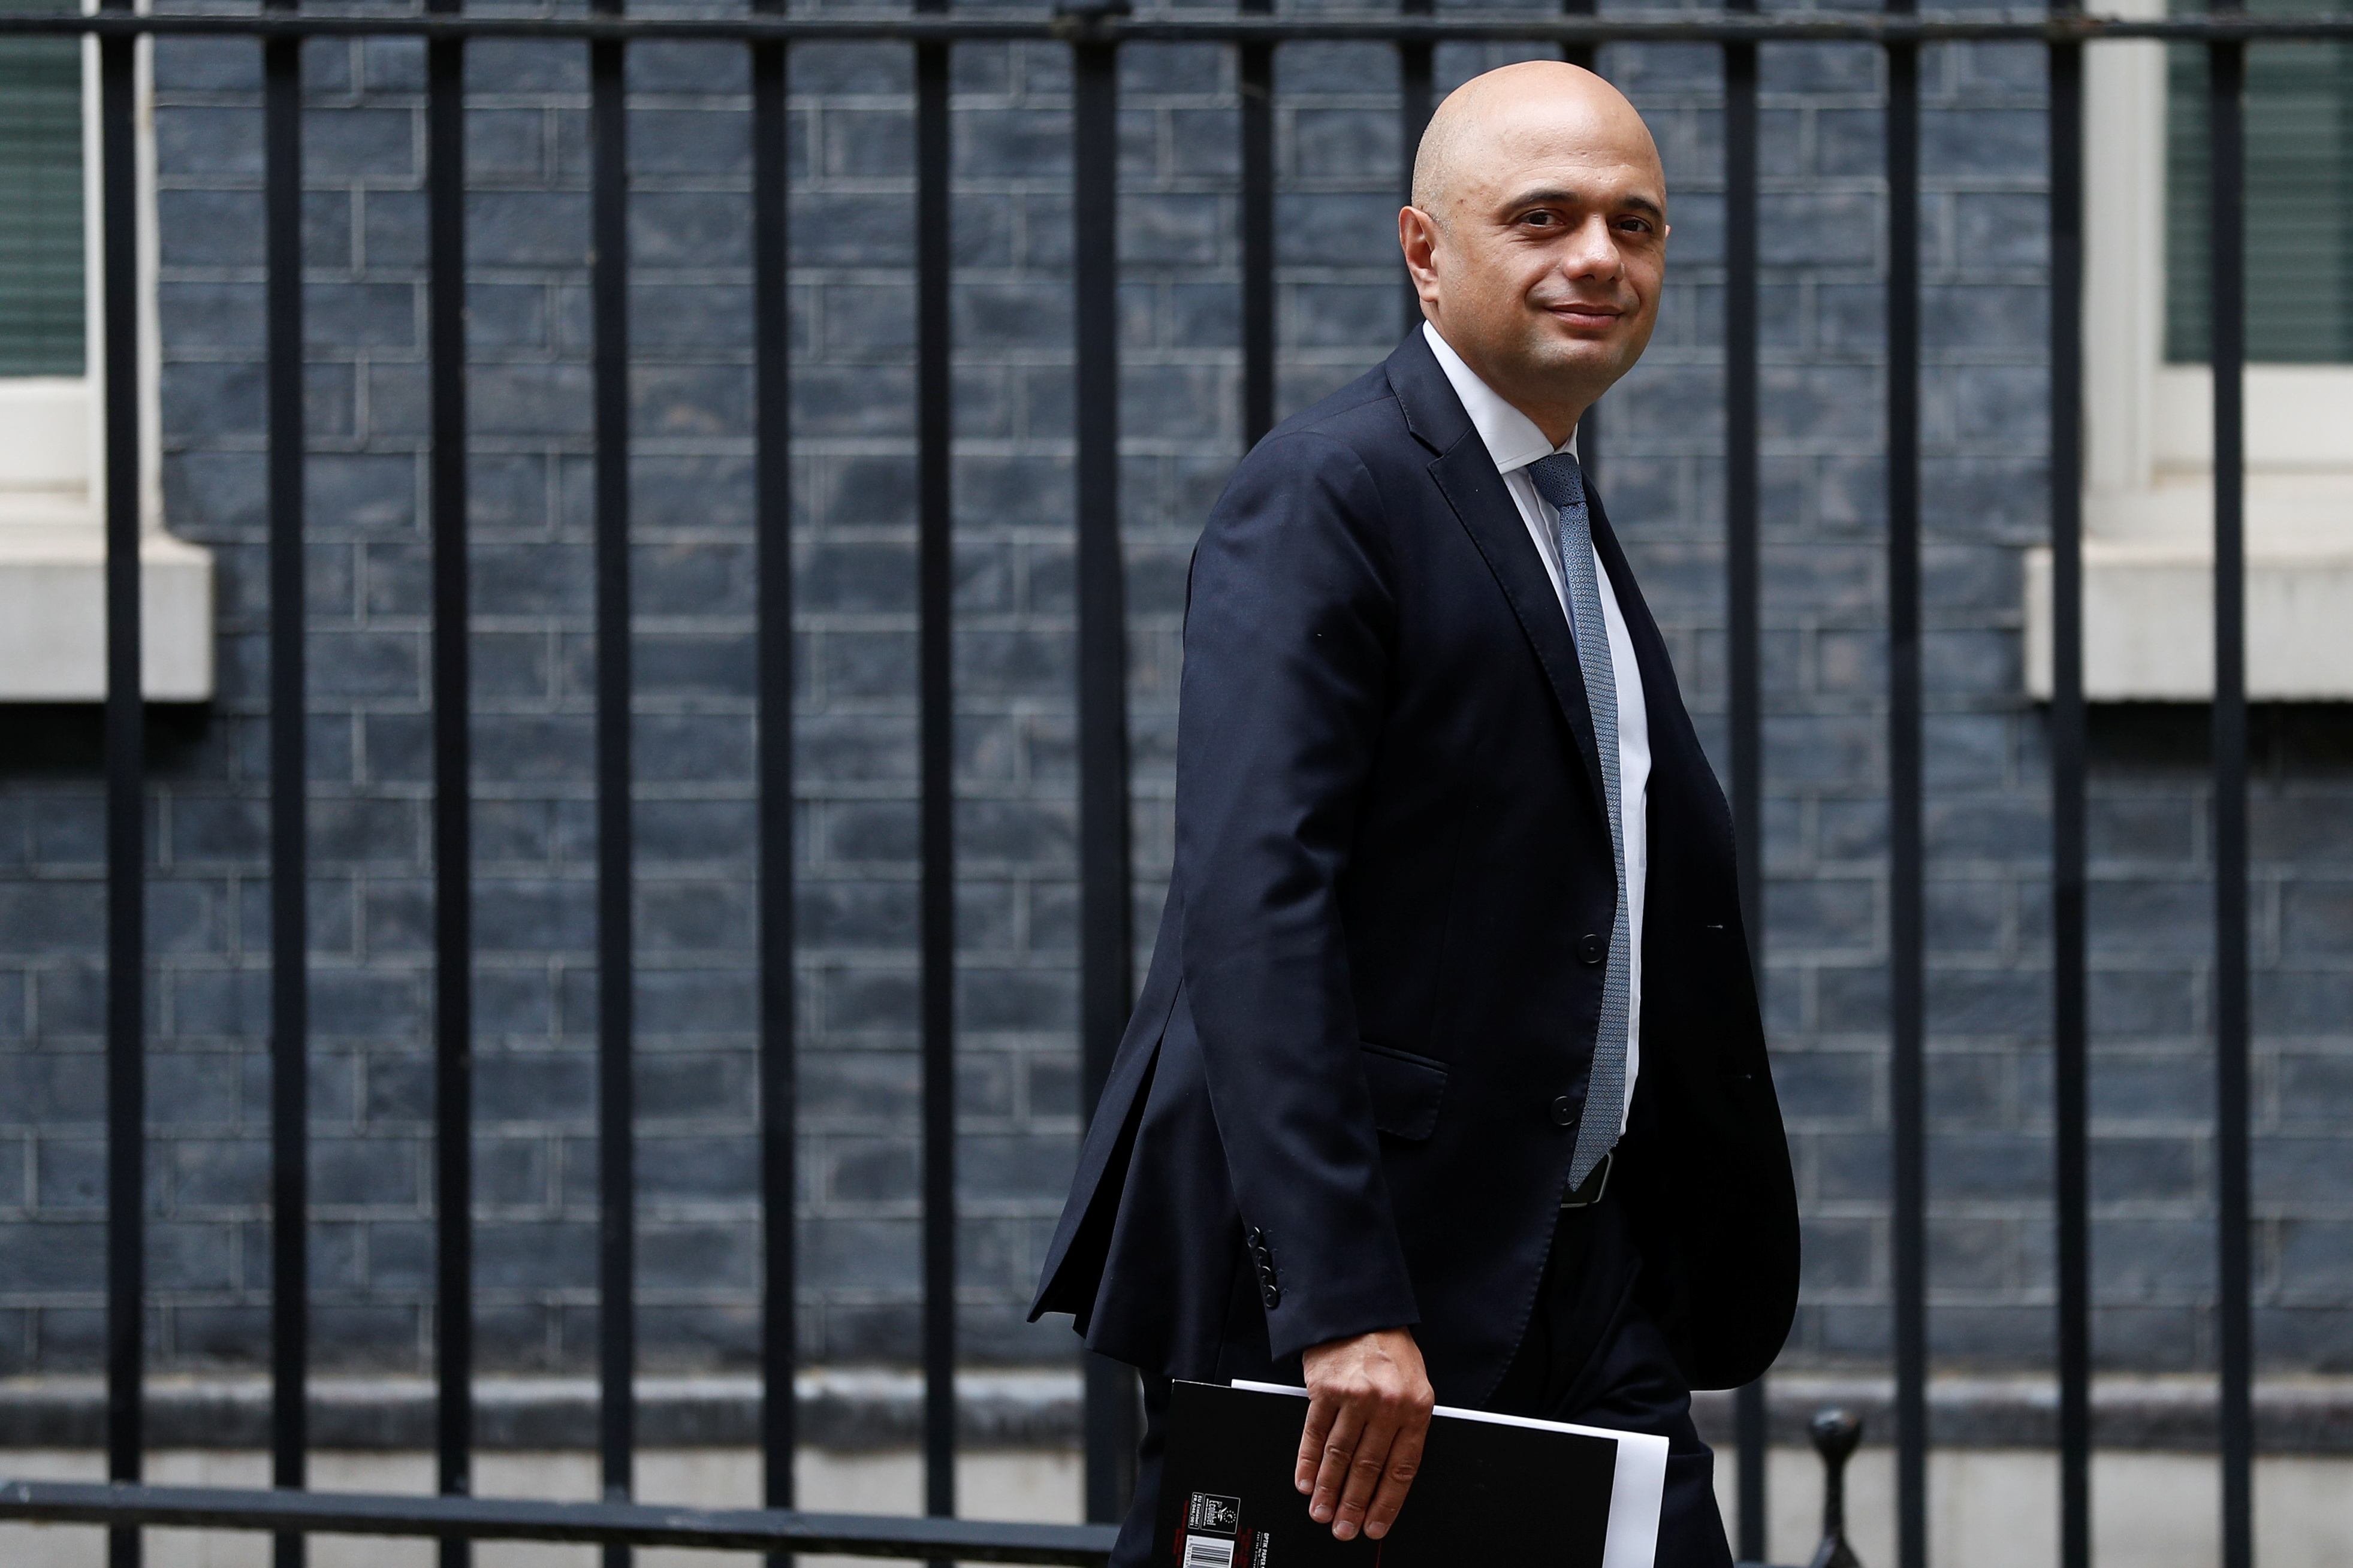 Health Secretary Sajid Javid walks on Downing Street in London, Britain, July 14, 2021. REUTERS/Peter Nicholls